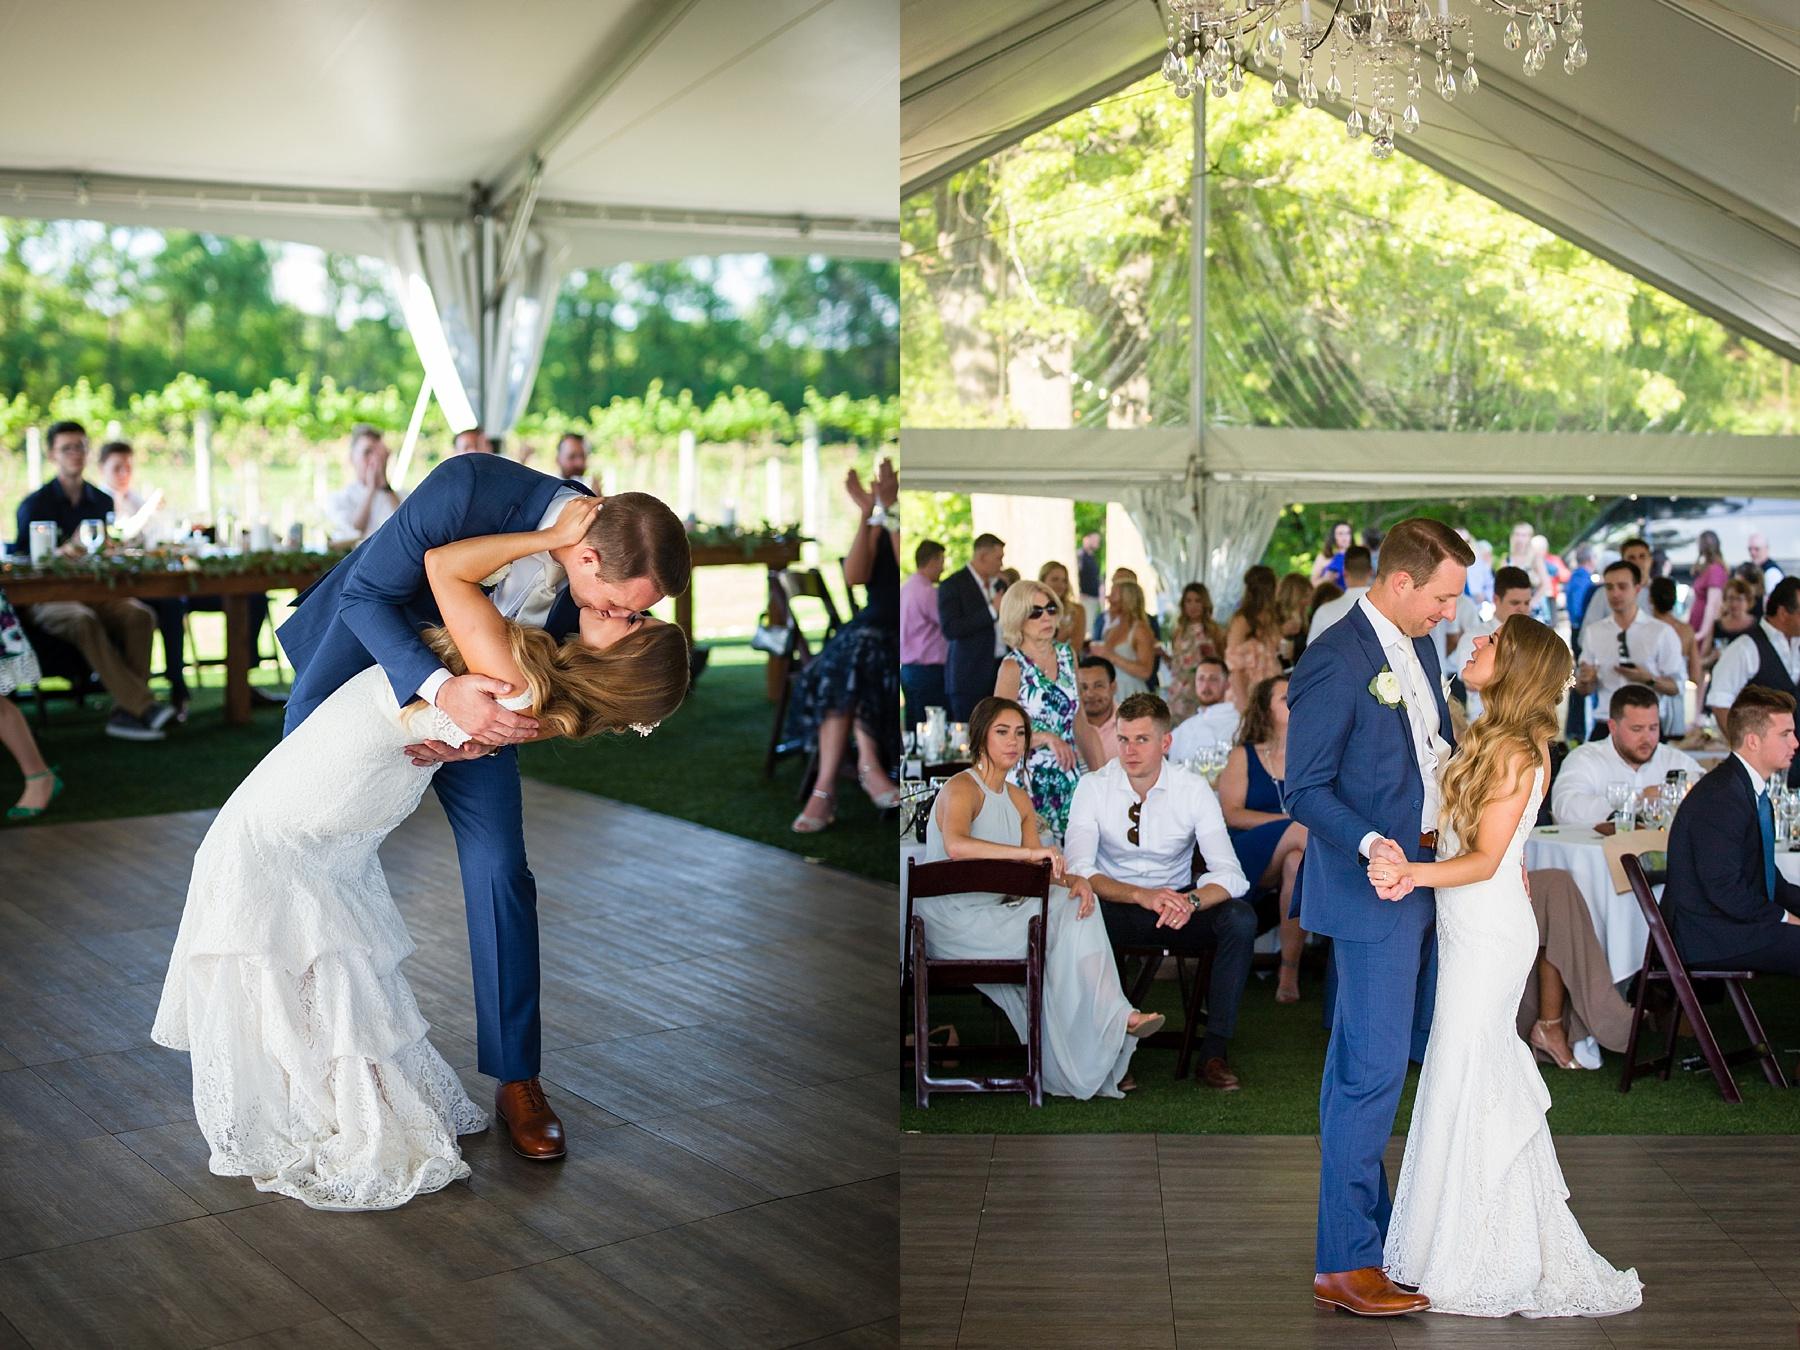 Brandon_Shafer_Photography_Kara_Doug_12_corners_Wedding_Benton_Harbor_0066.jpg